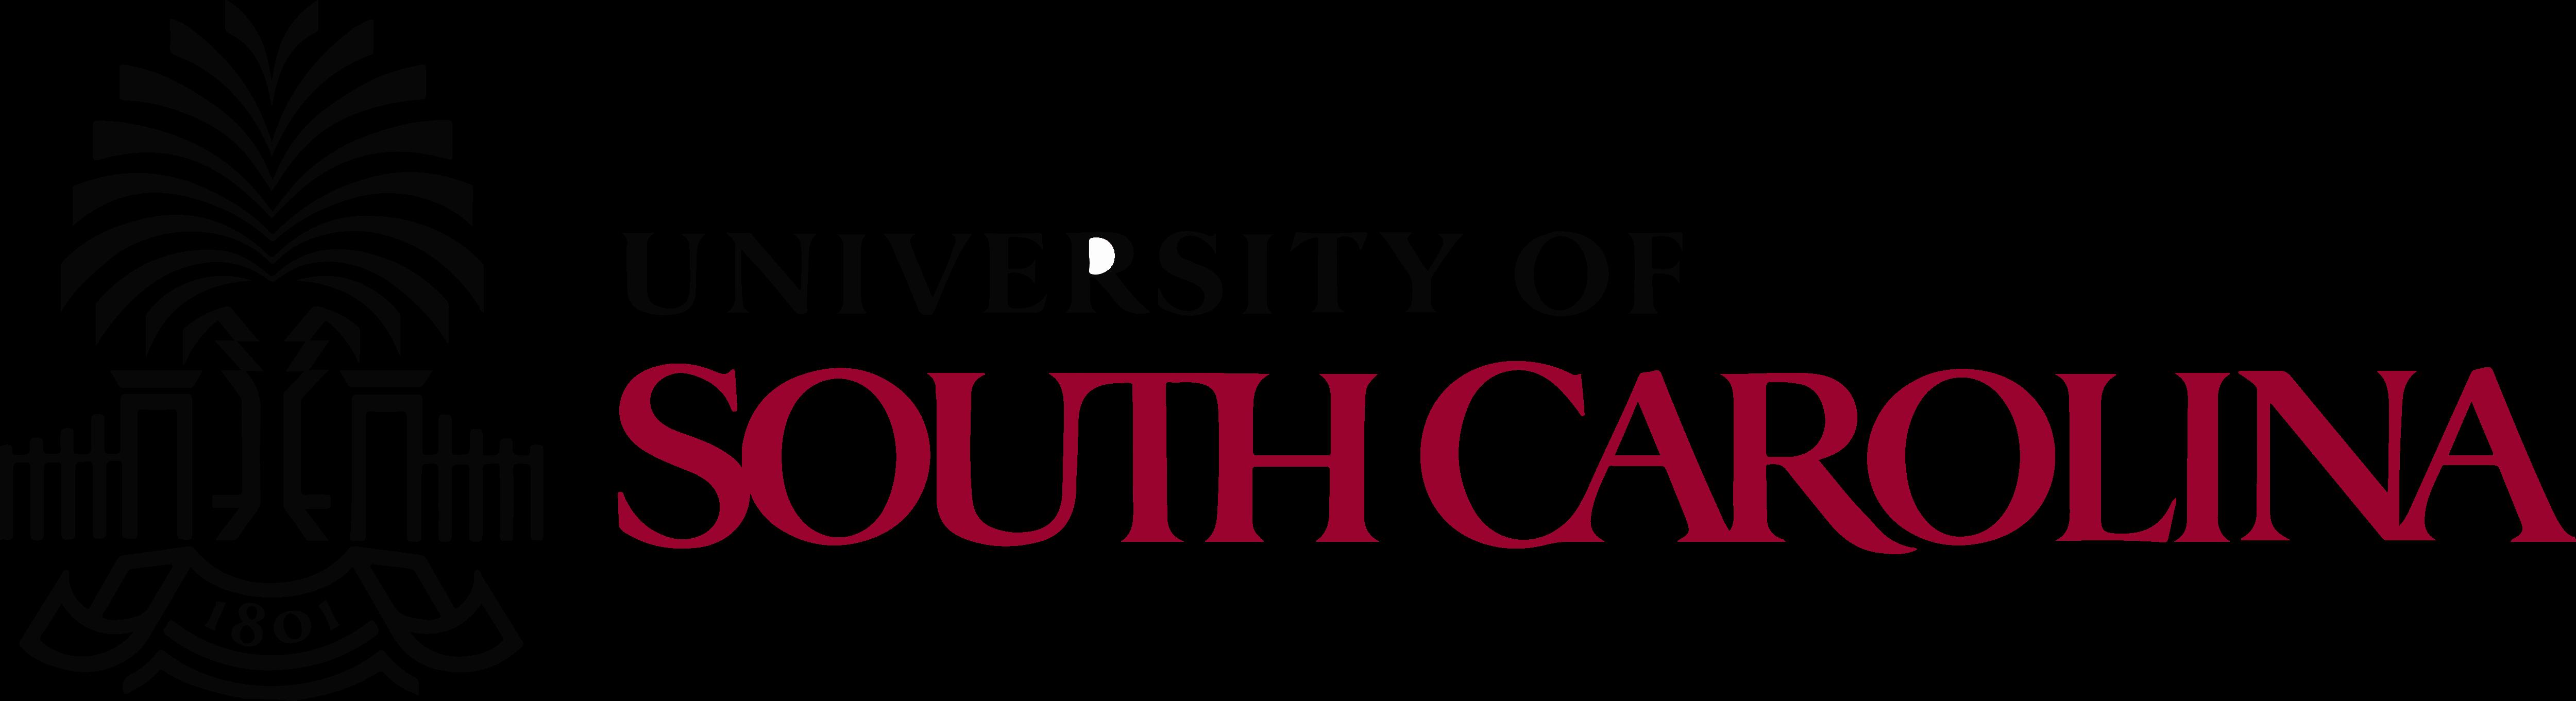 University of South Carolina Logo